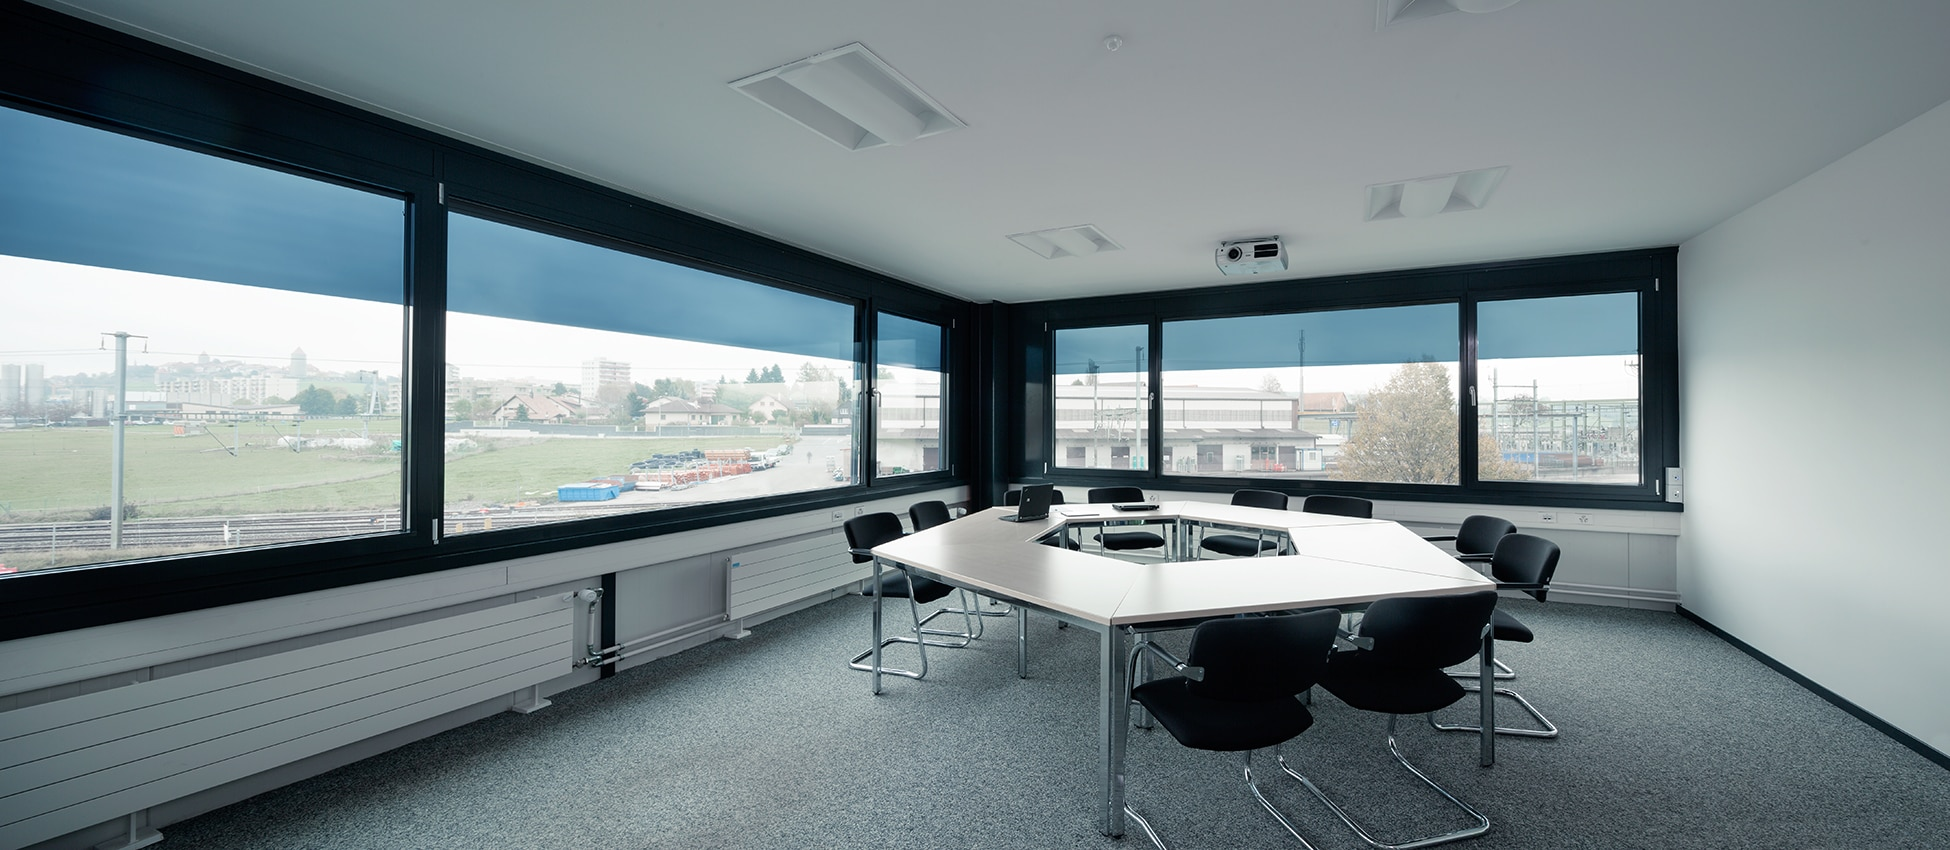 meeting room at saint gobain tower